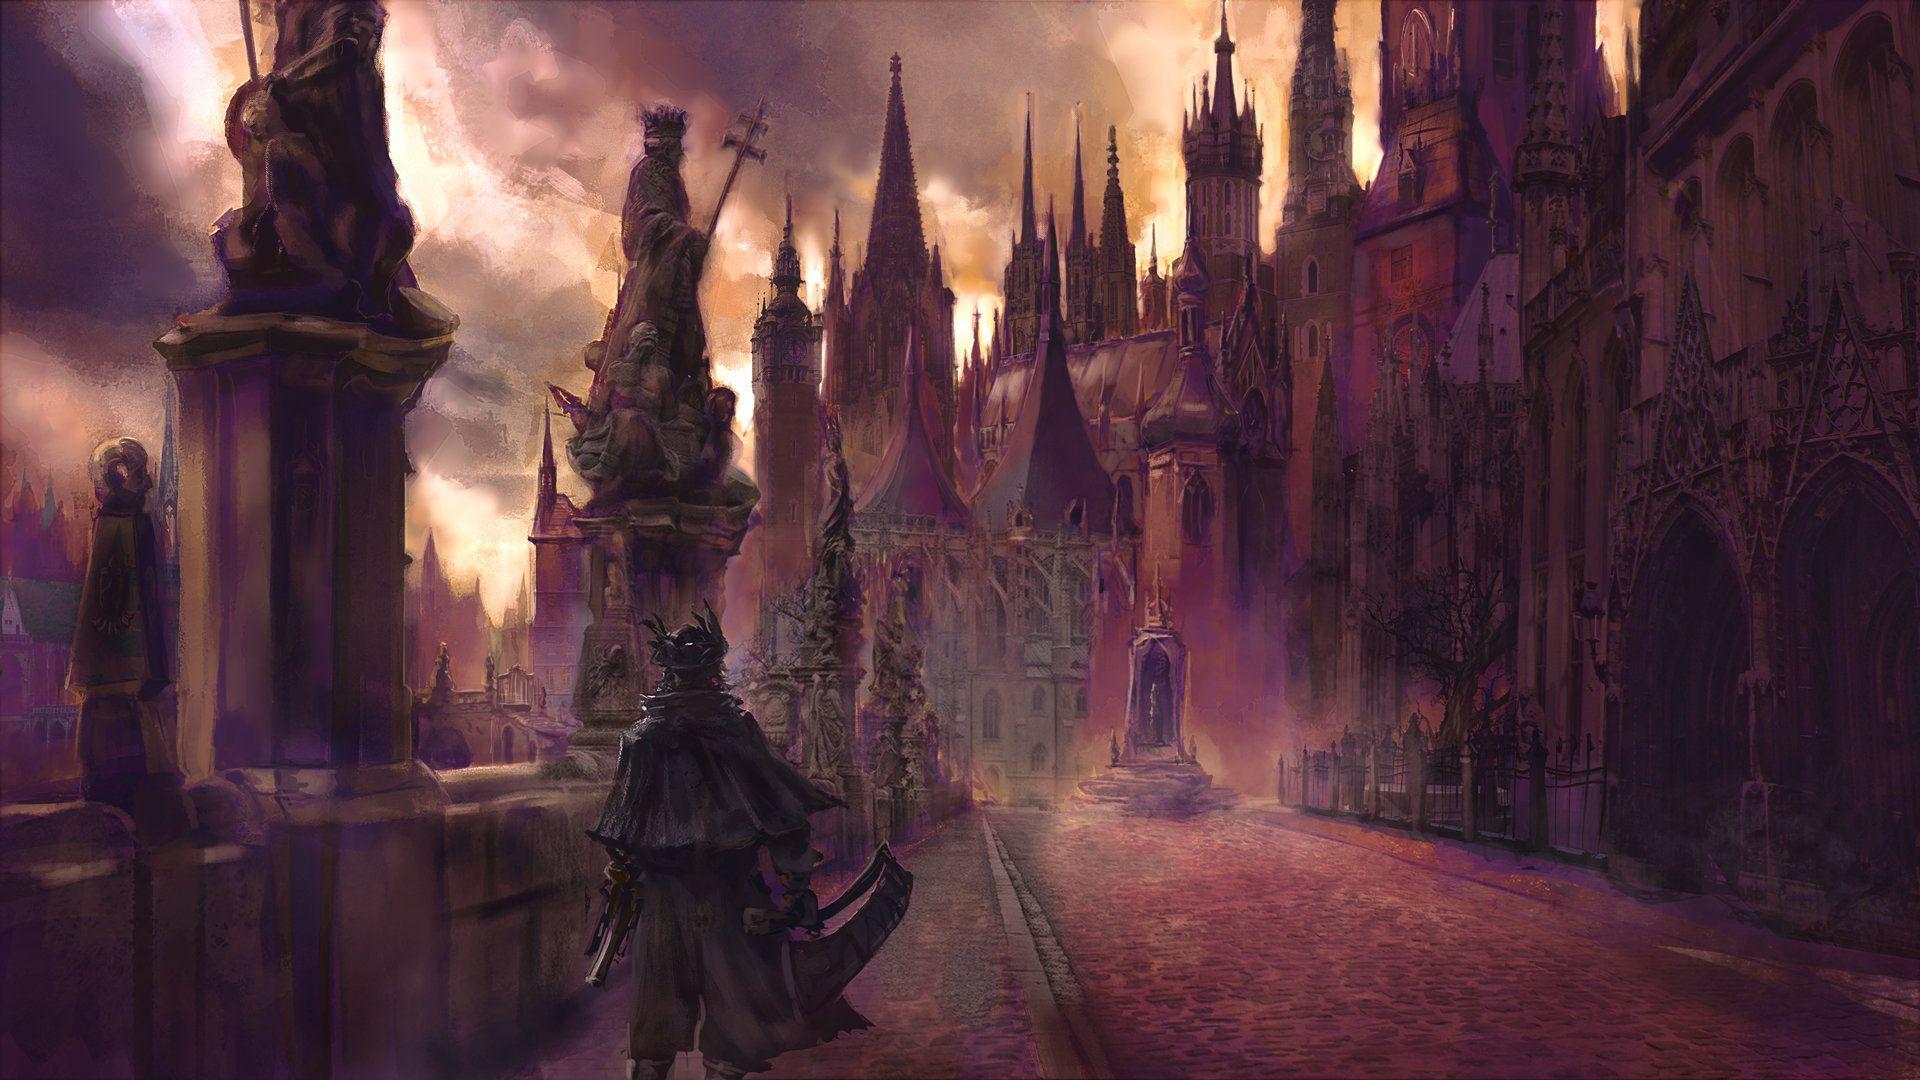 Yharnam Cathedral Ward, Edouard Noisette | Dark souls art